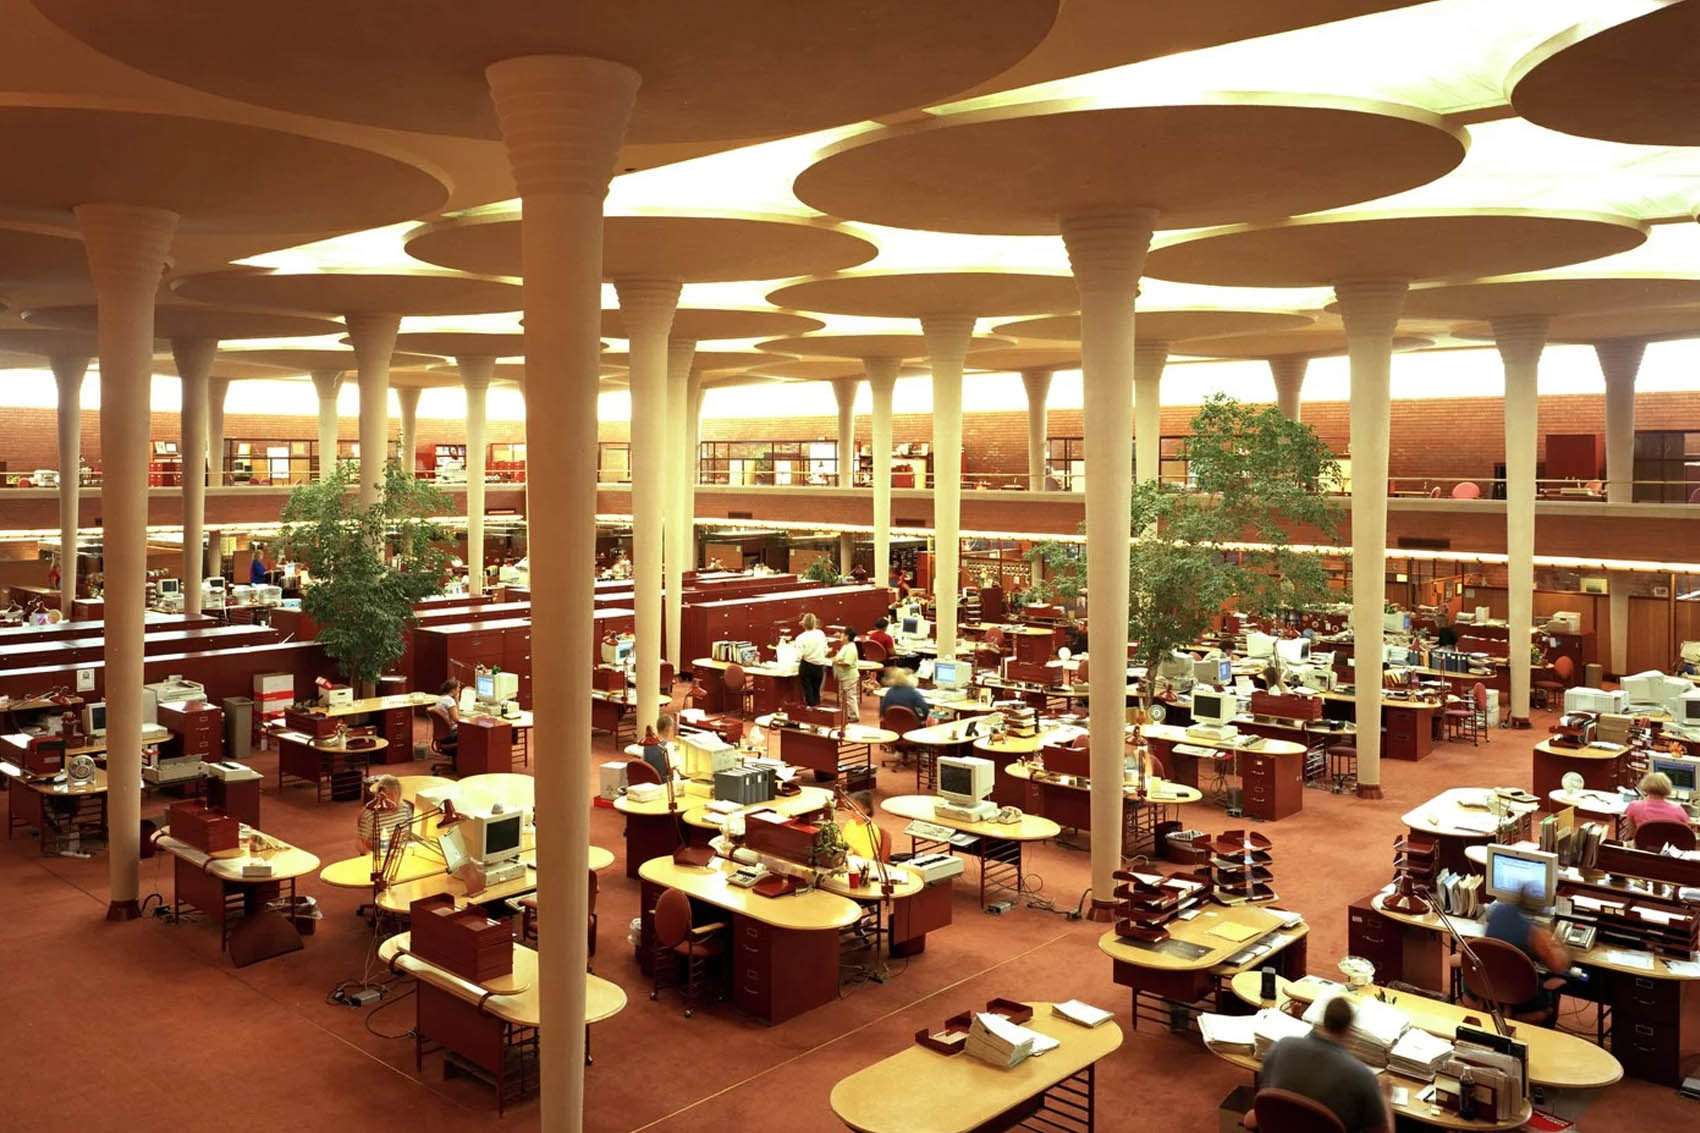 De-Vorm-For-Office-The-Great-Workroom-in-the-Johnson-Wax-Building